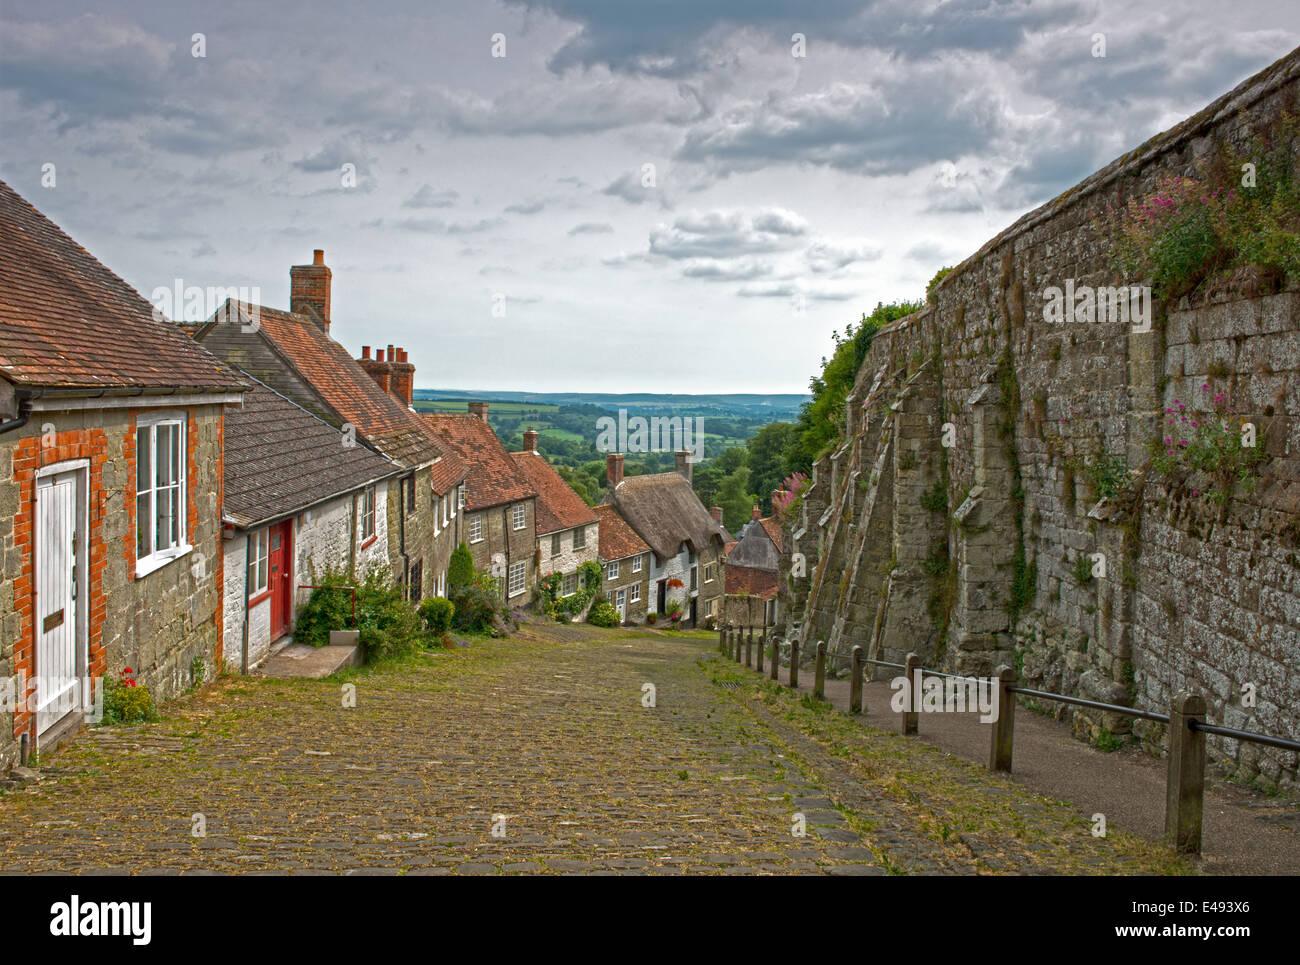 Gold Hill, Shaftesbury, (Hovis Advert) Dorset, England, Uk. - Stock Image